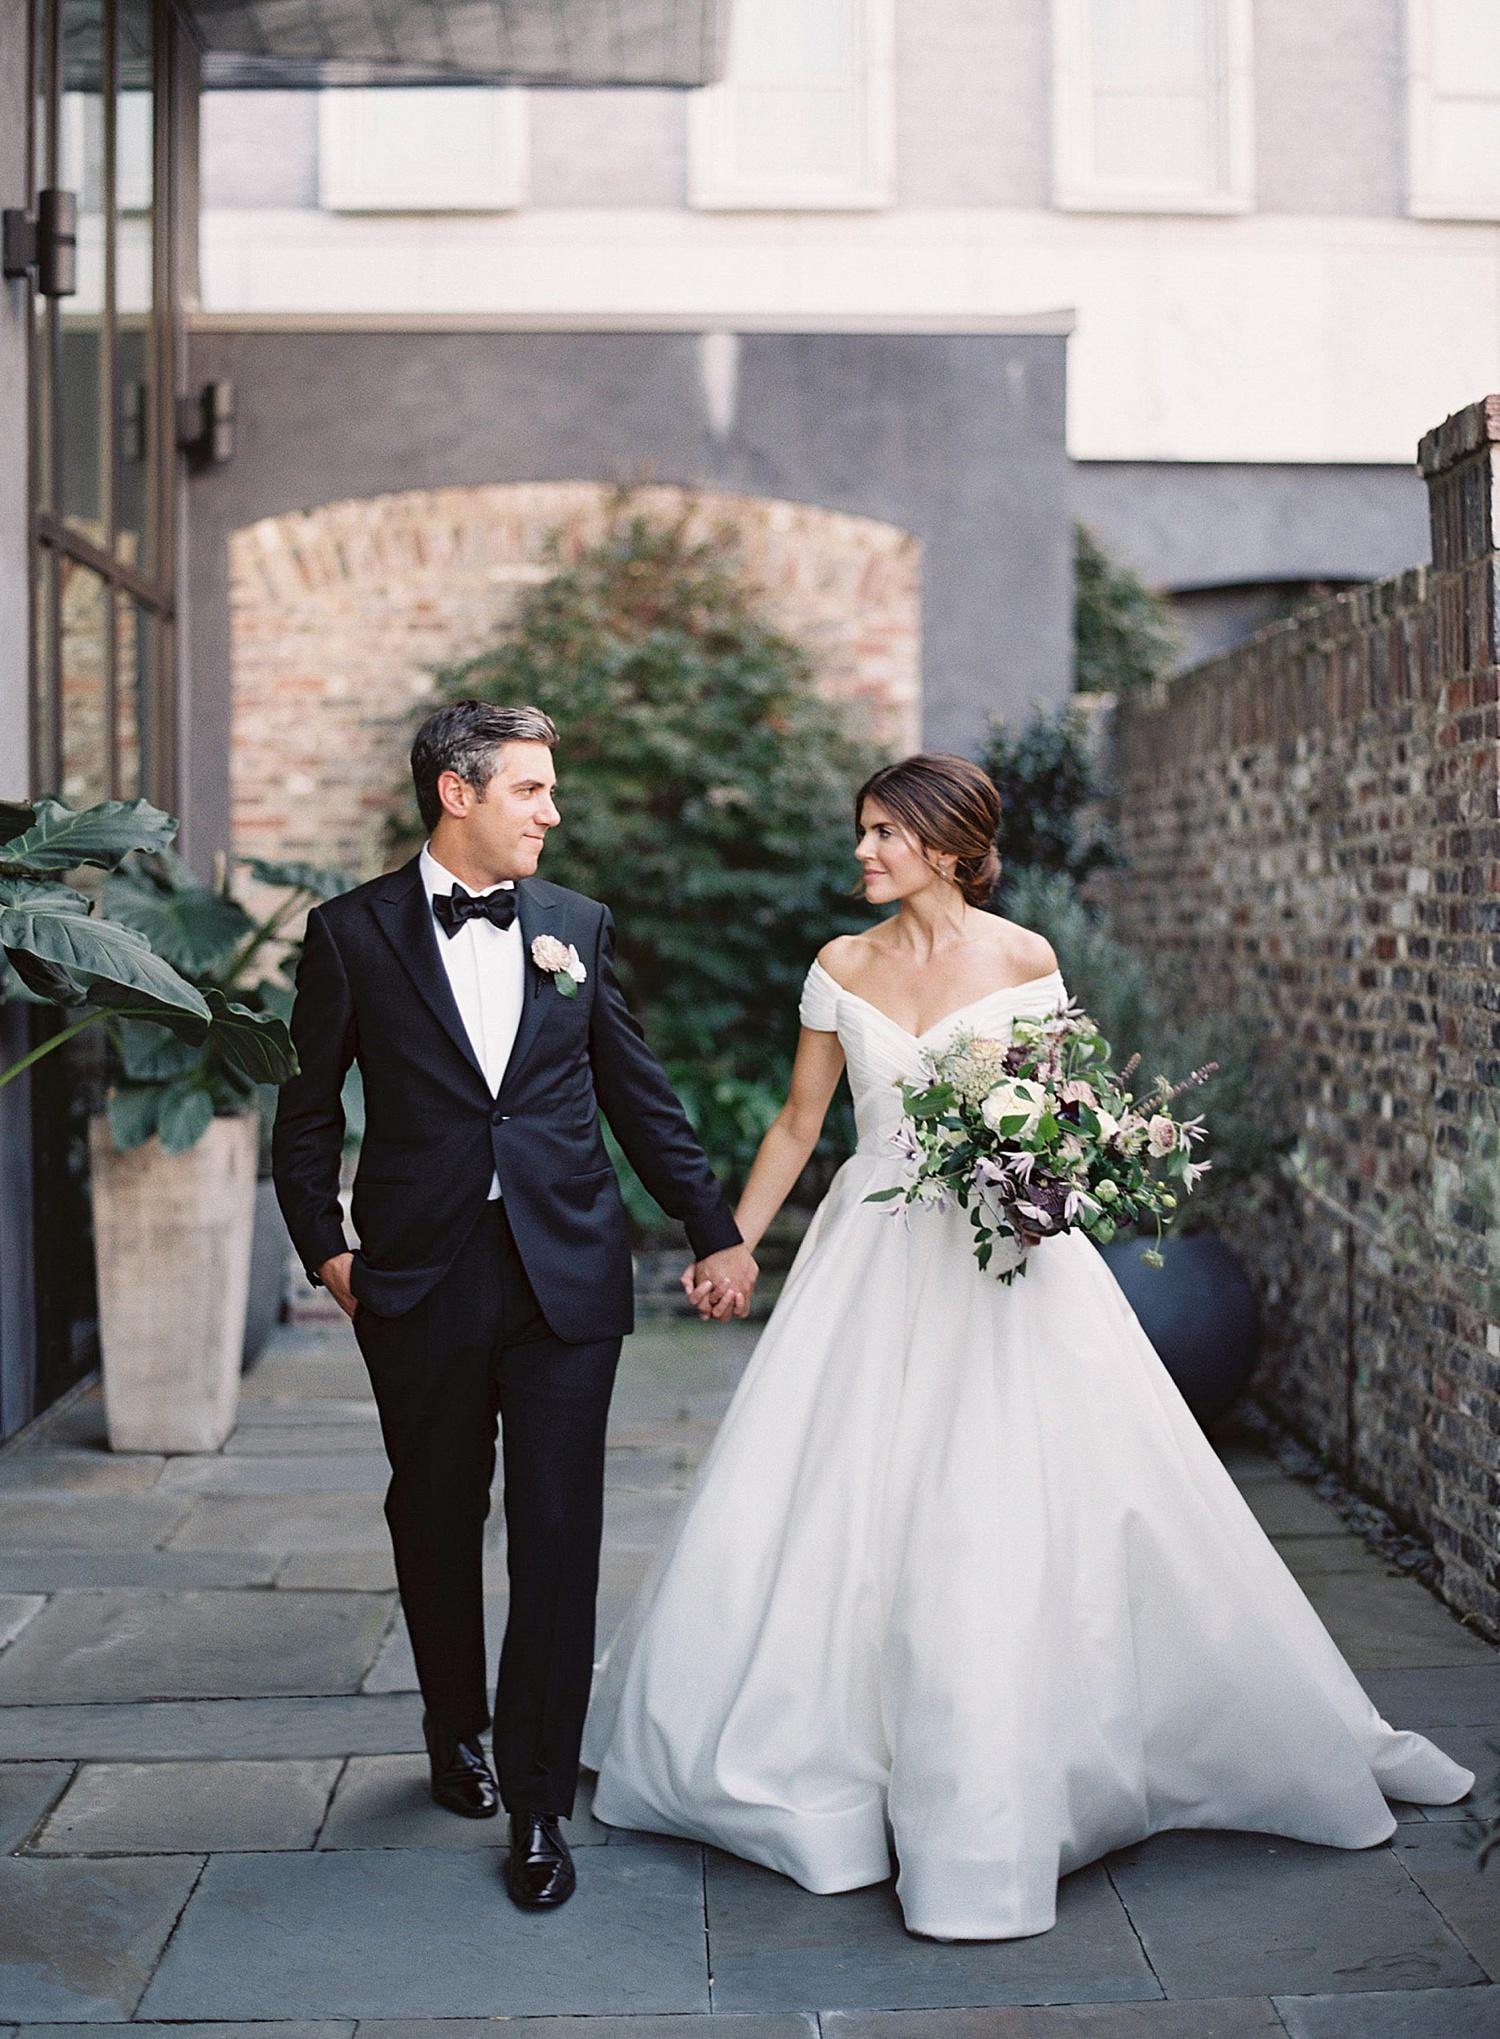 1_dewberry_charleston_wedding.jpg